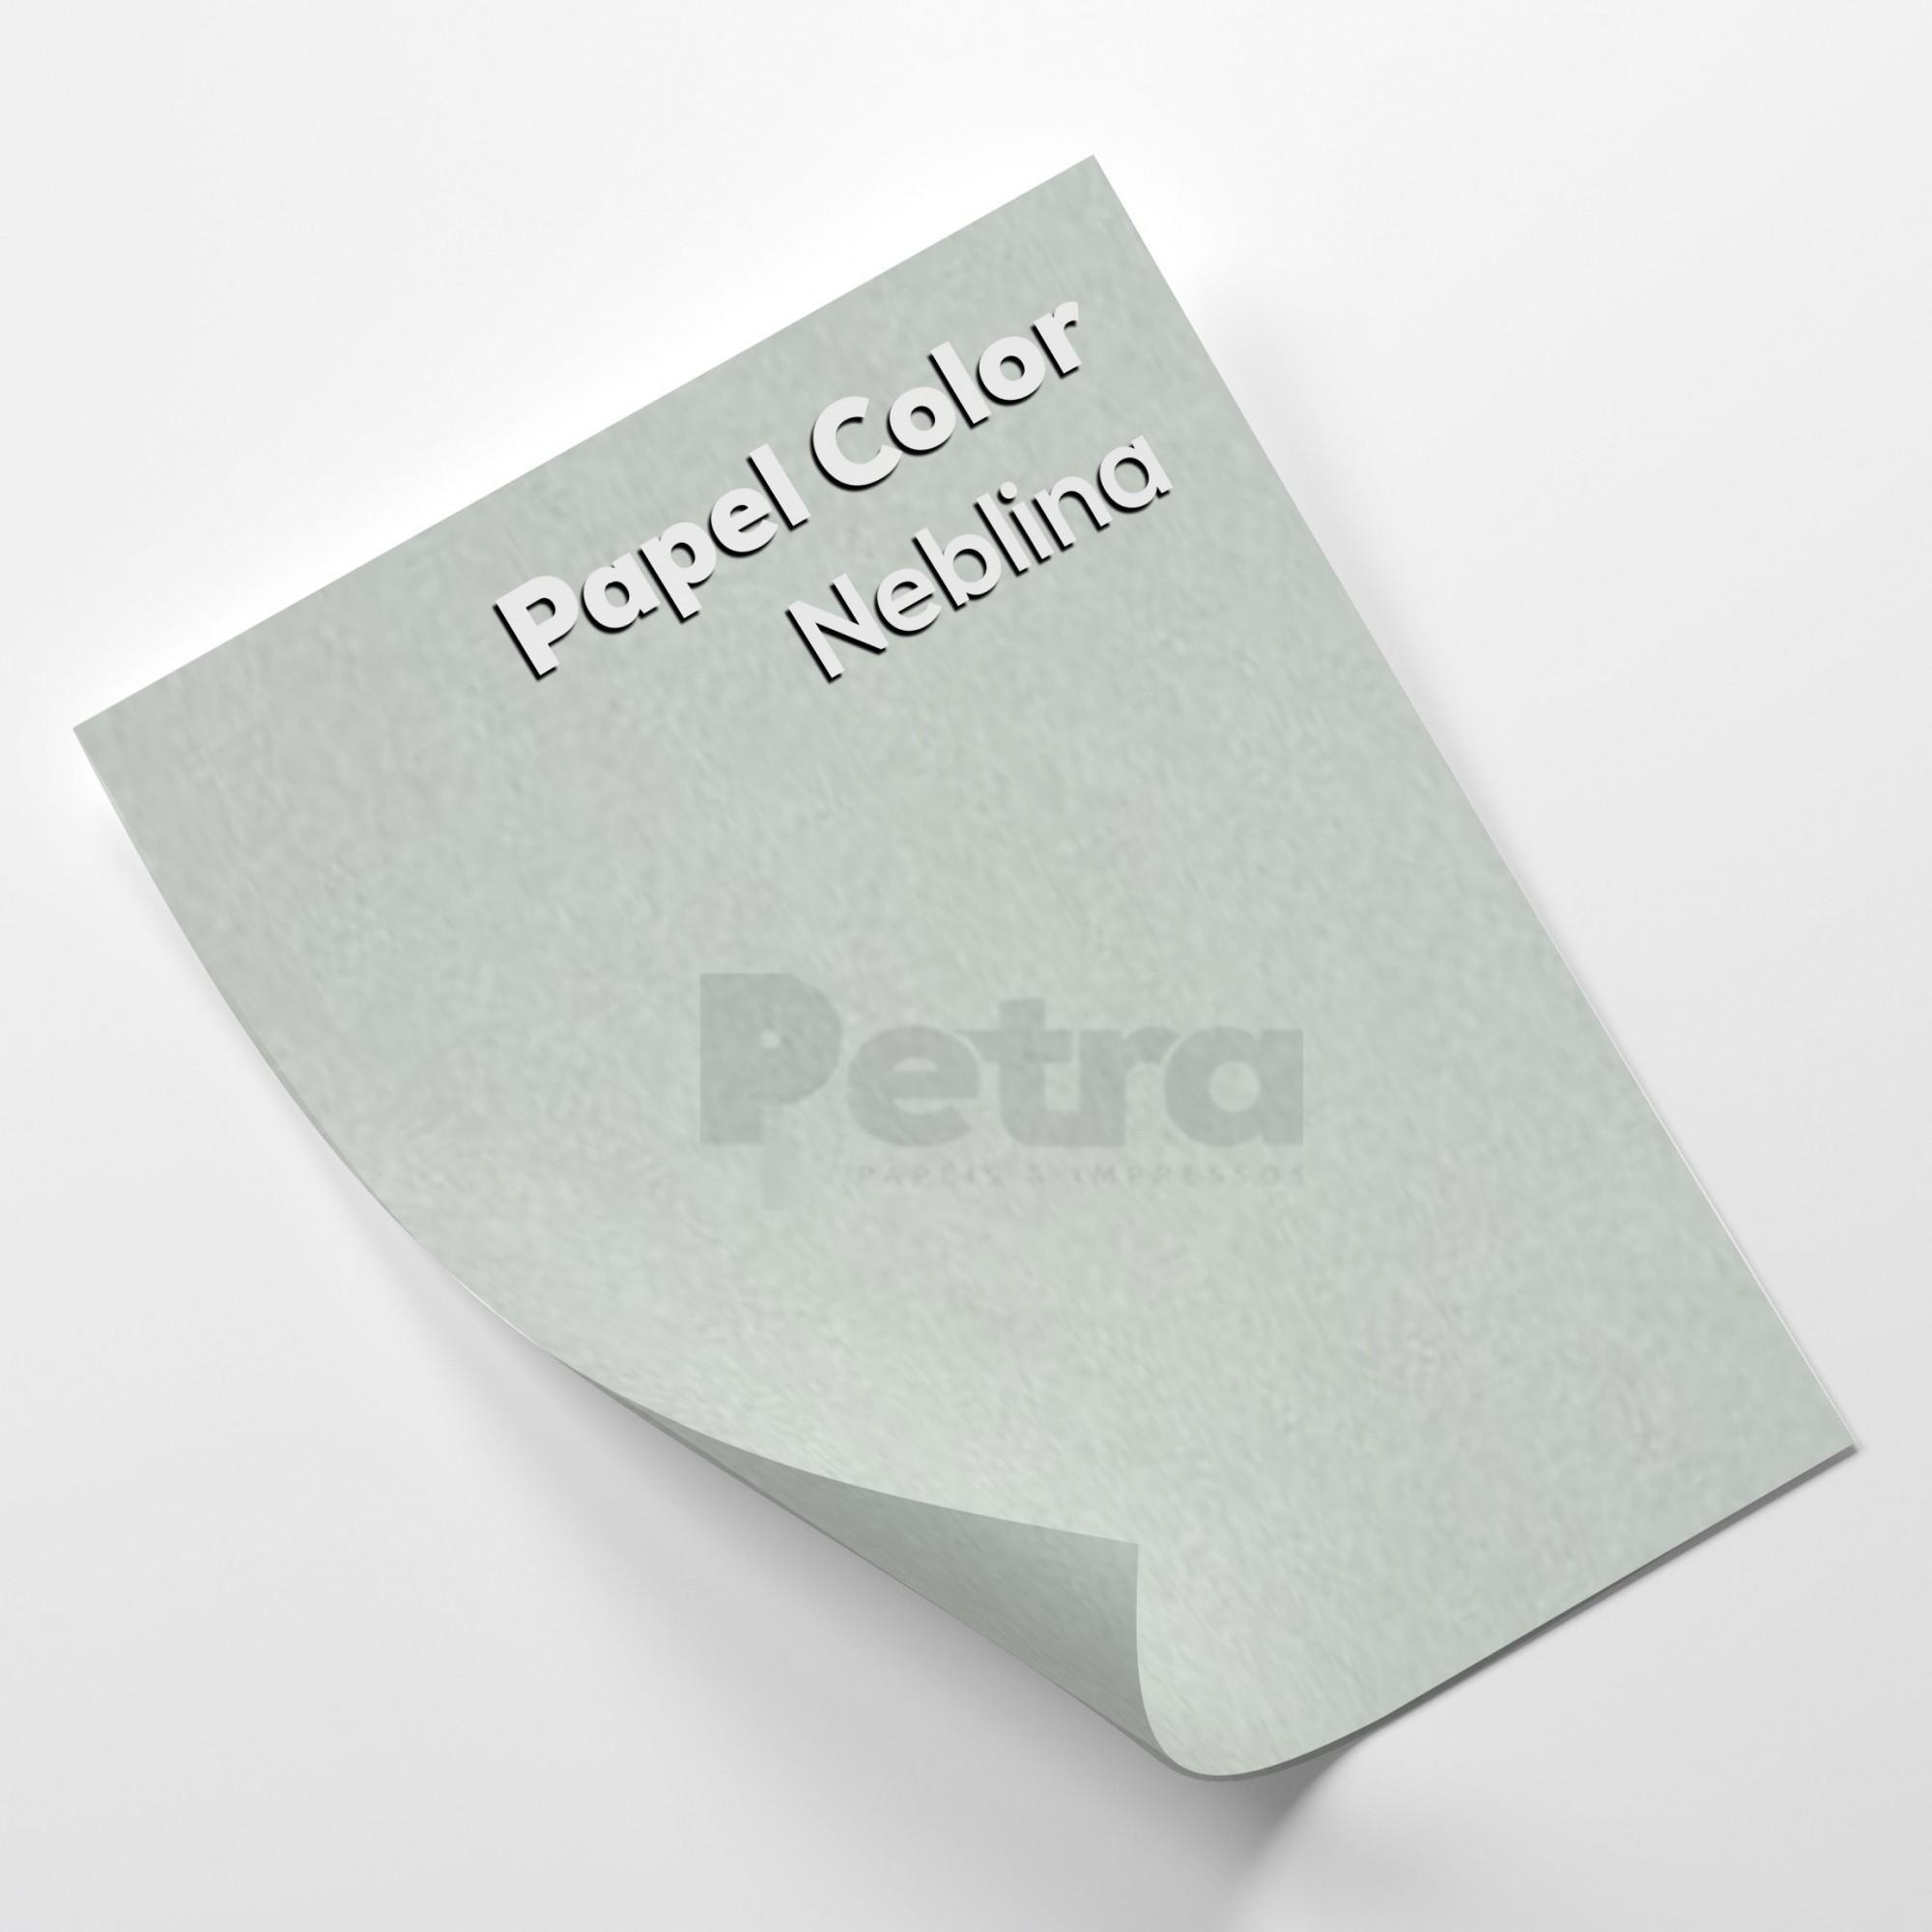 Papel Colorido Neblina - Cinza Tam. 66x96cm 180g/m² 10 Folhas